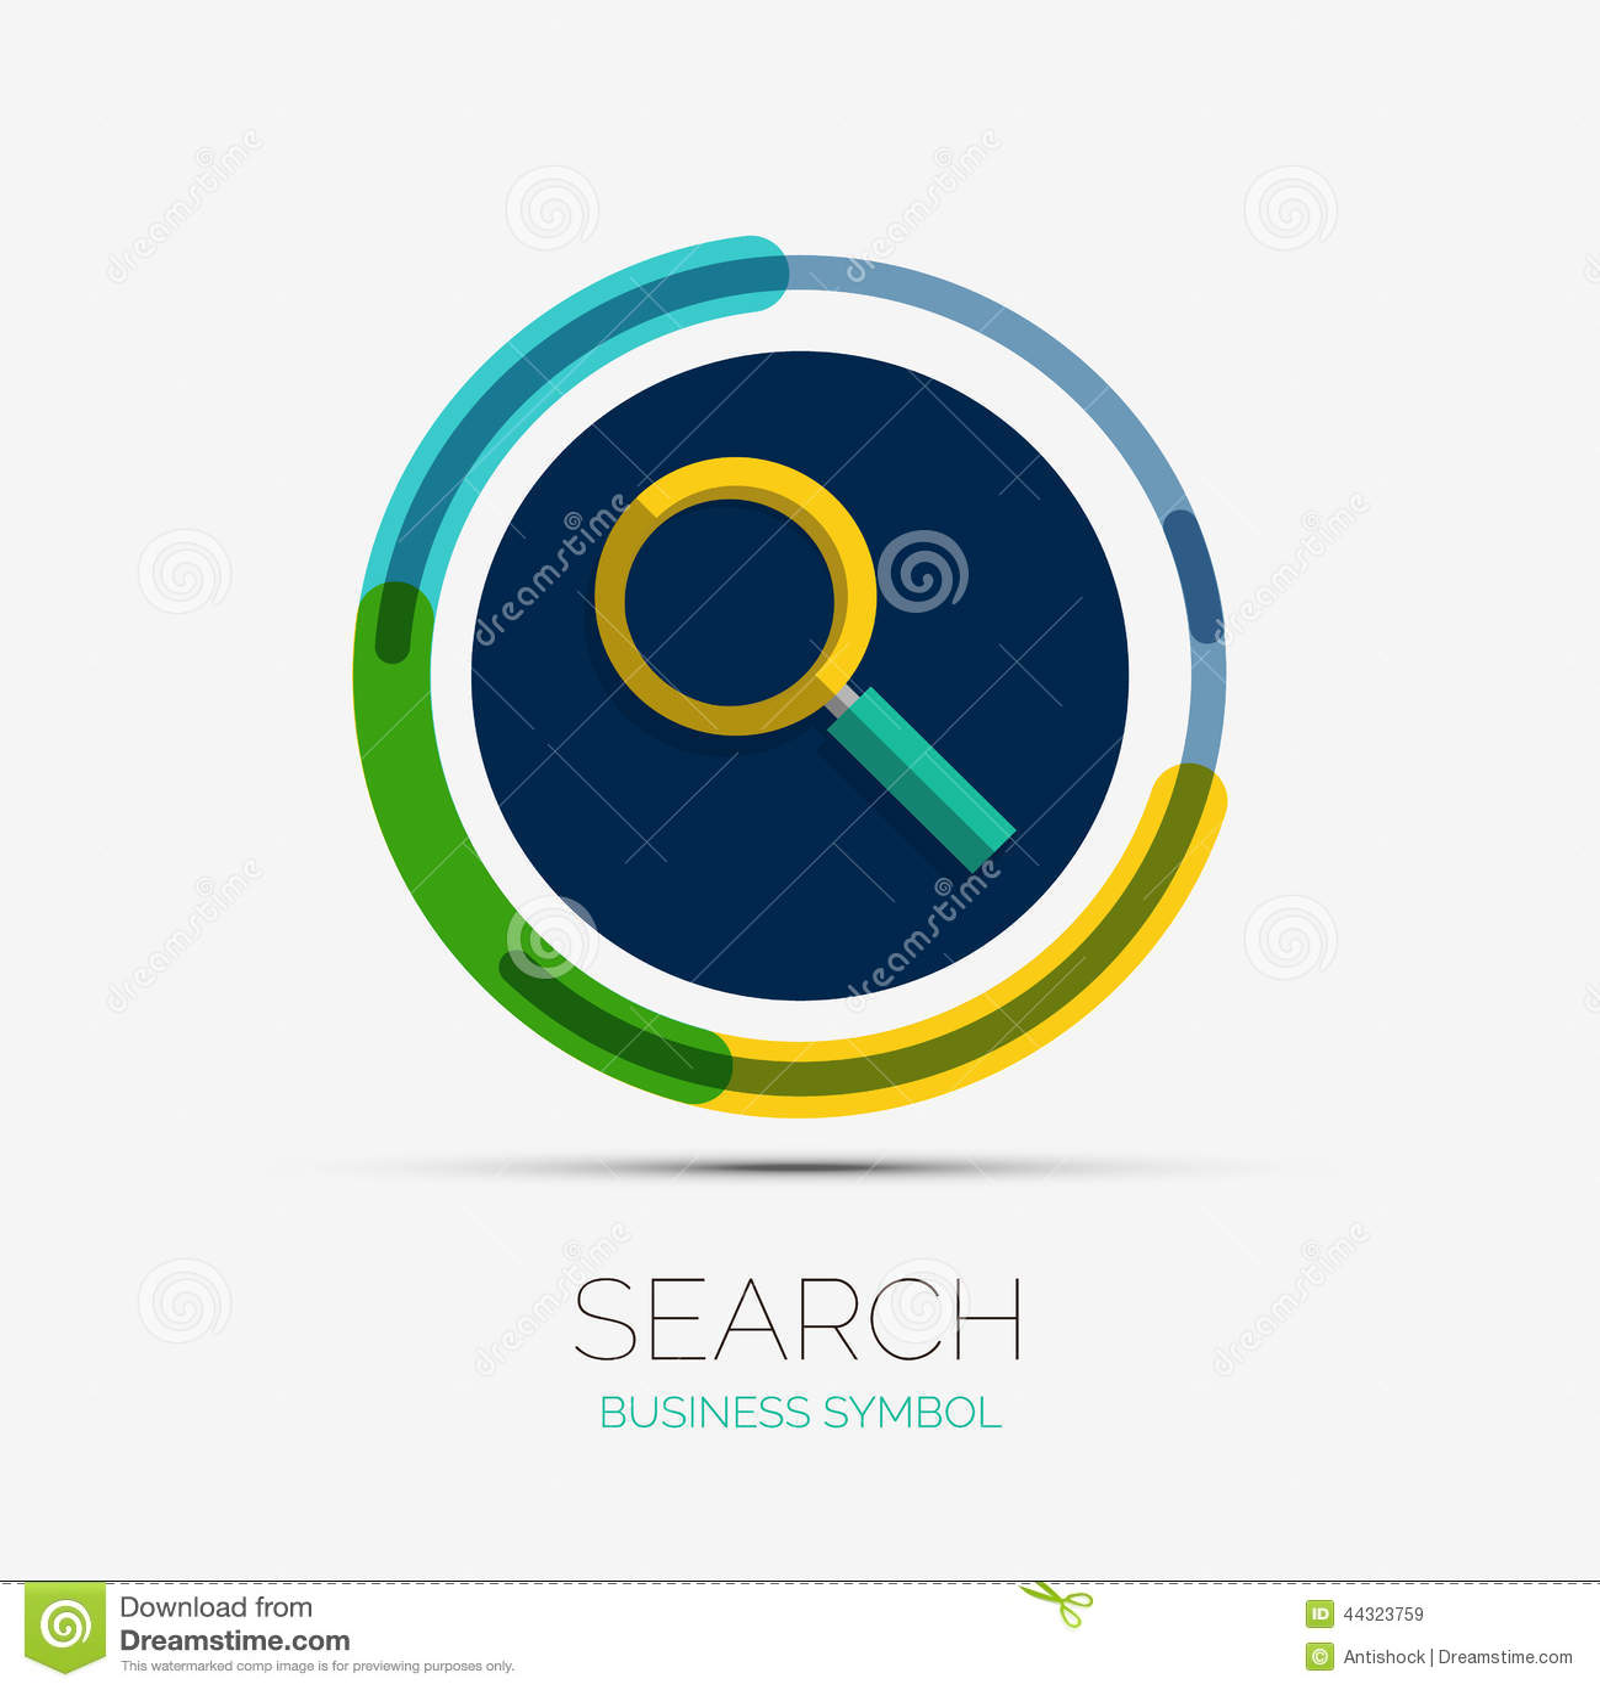 Search icon company logo minimal design stock vector for Design finder